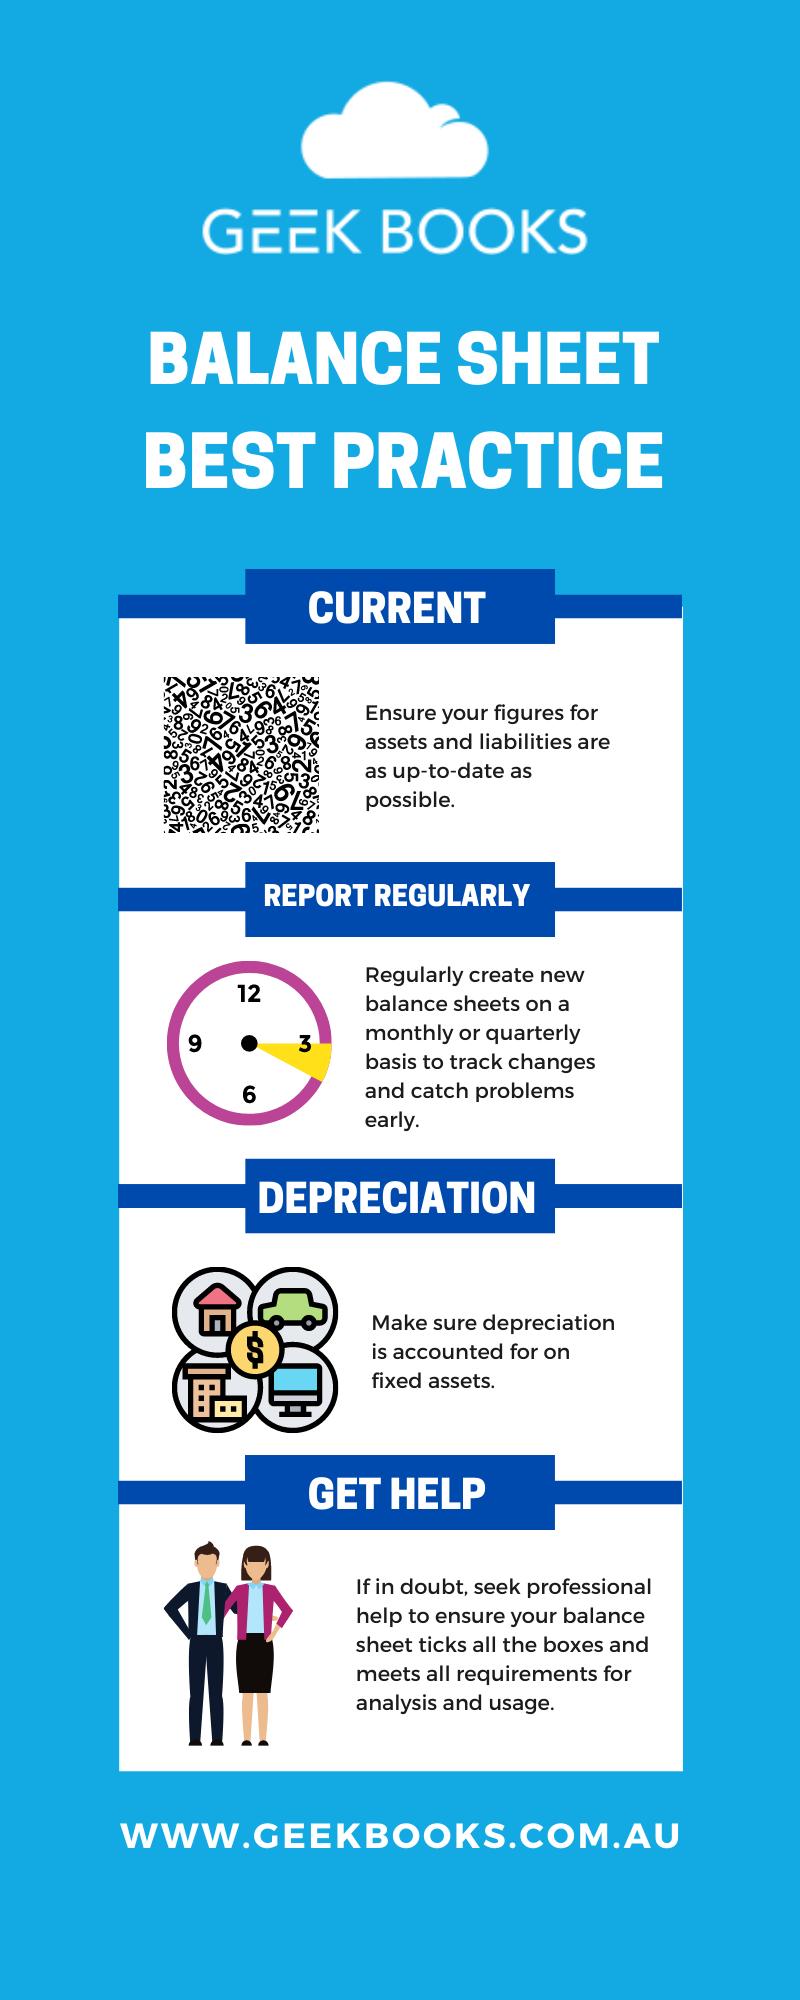 Balance Sheet Infographic